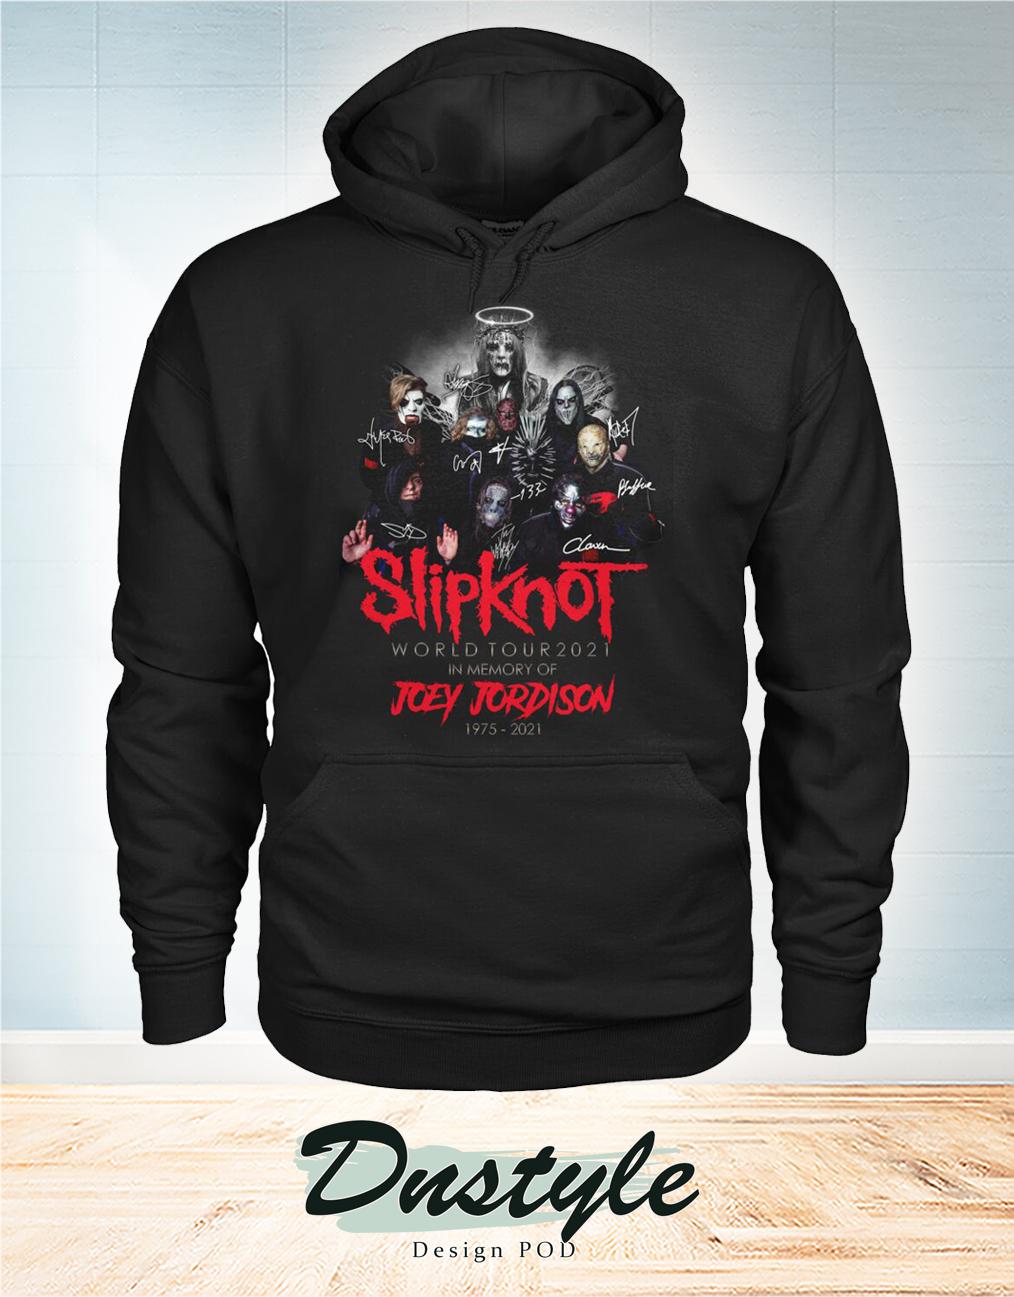 Slipknot world tour 2021 in memory of Joey Jordison 1975 2021 hoodie